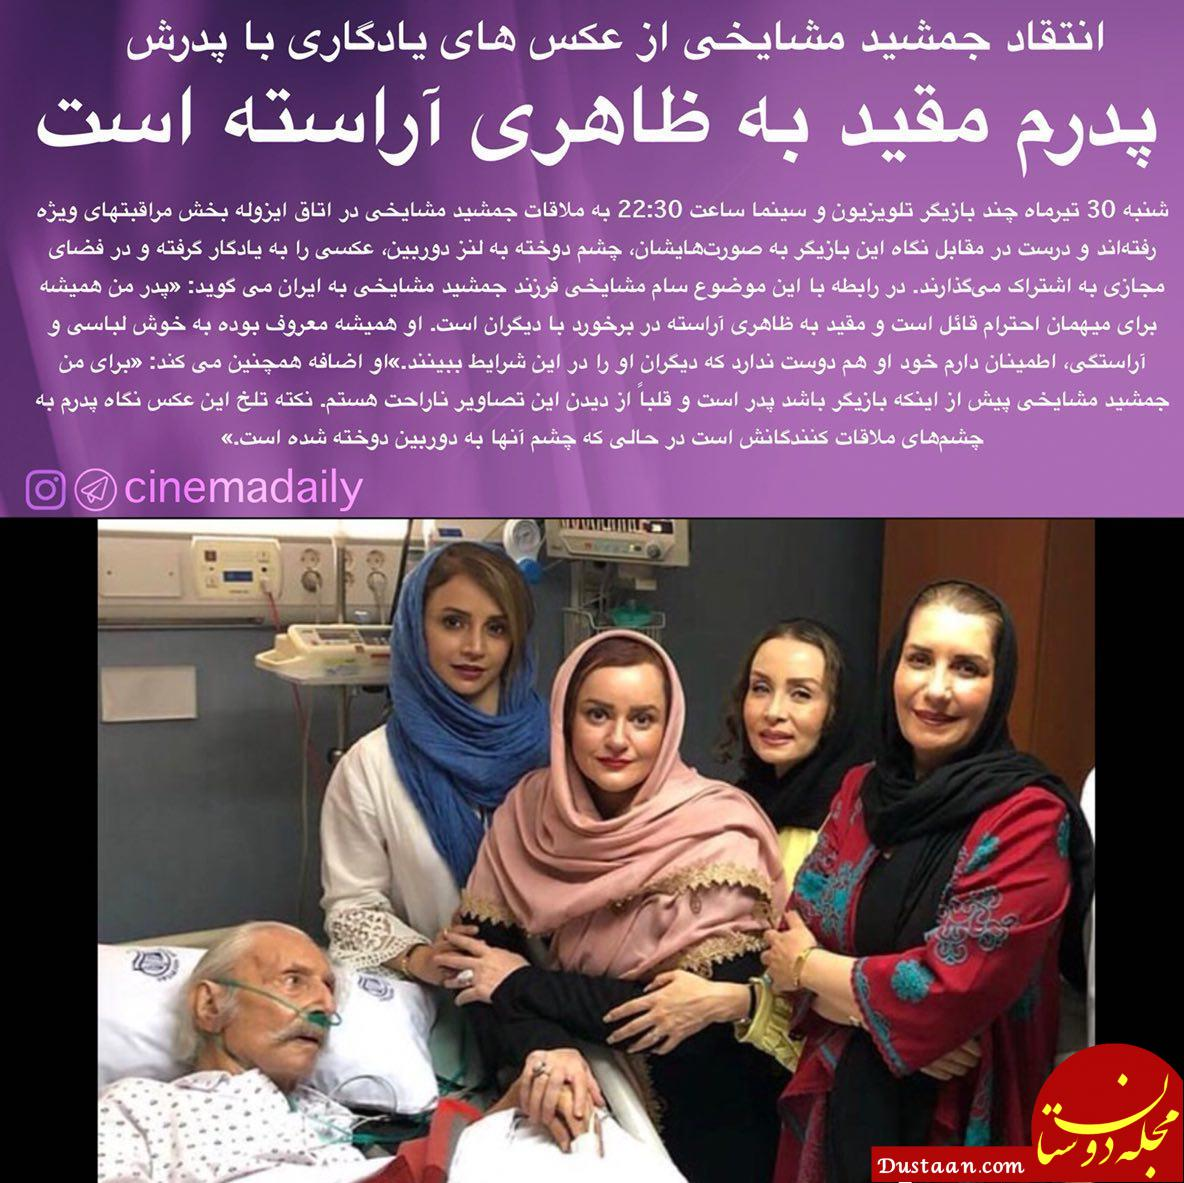 www.dustaan.com انتقاد فرزند جمشید مشایخی ازسلفی بازیگران با پدرش در بیمارستان +عکس